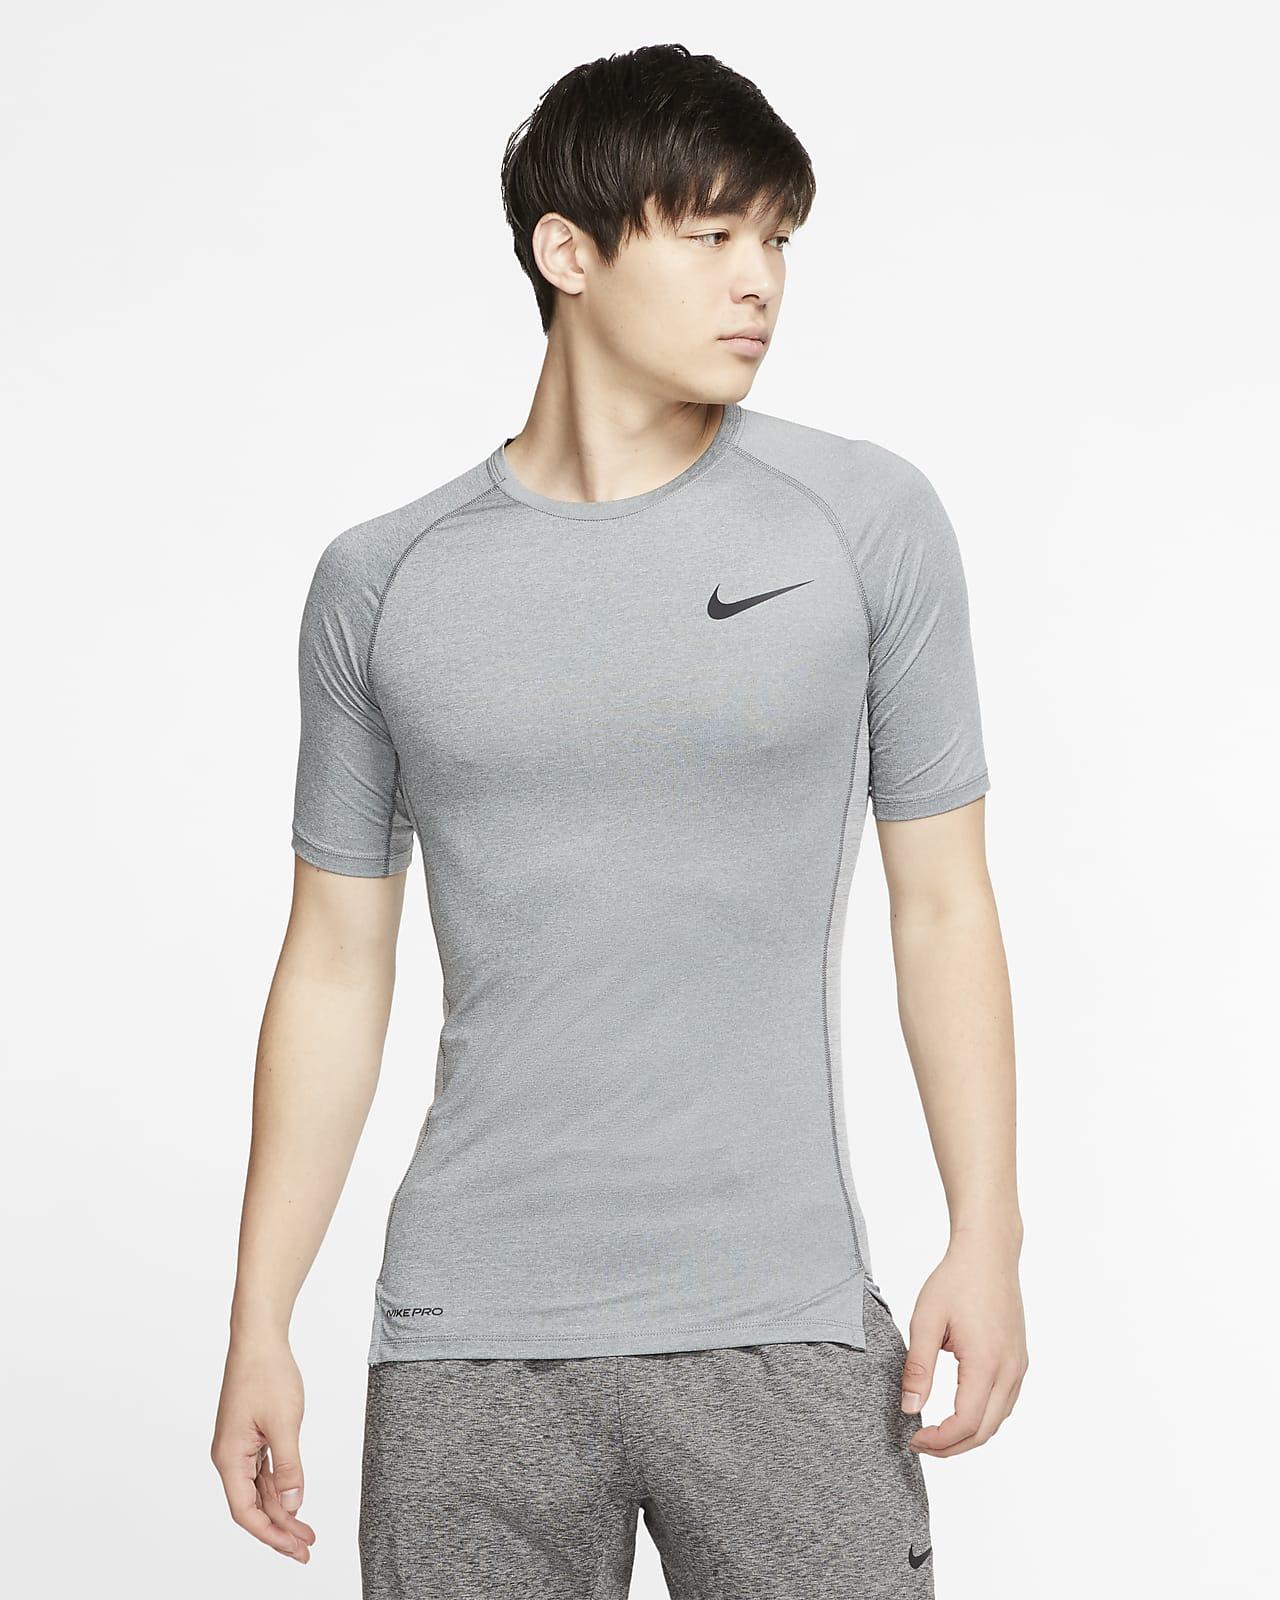 Nike Pro Men's Tight-Fit Short-Sleeve Top